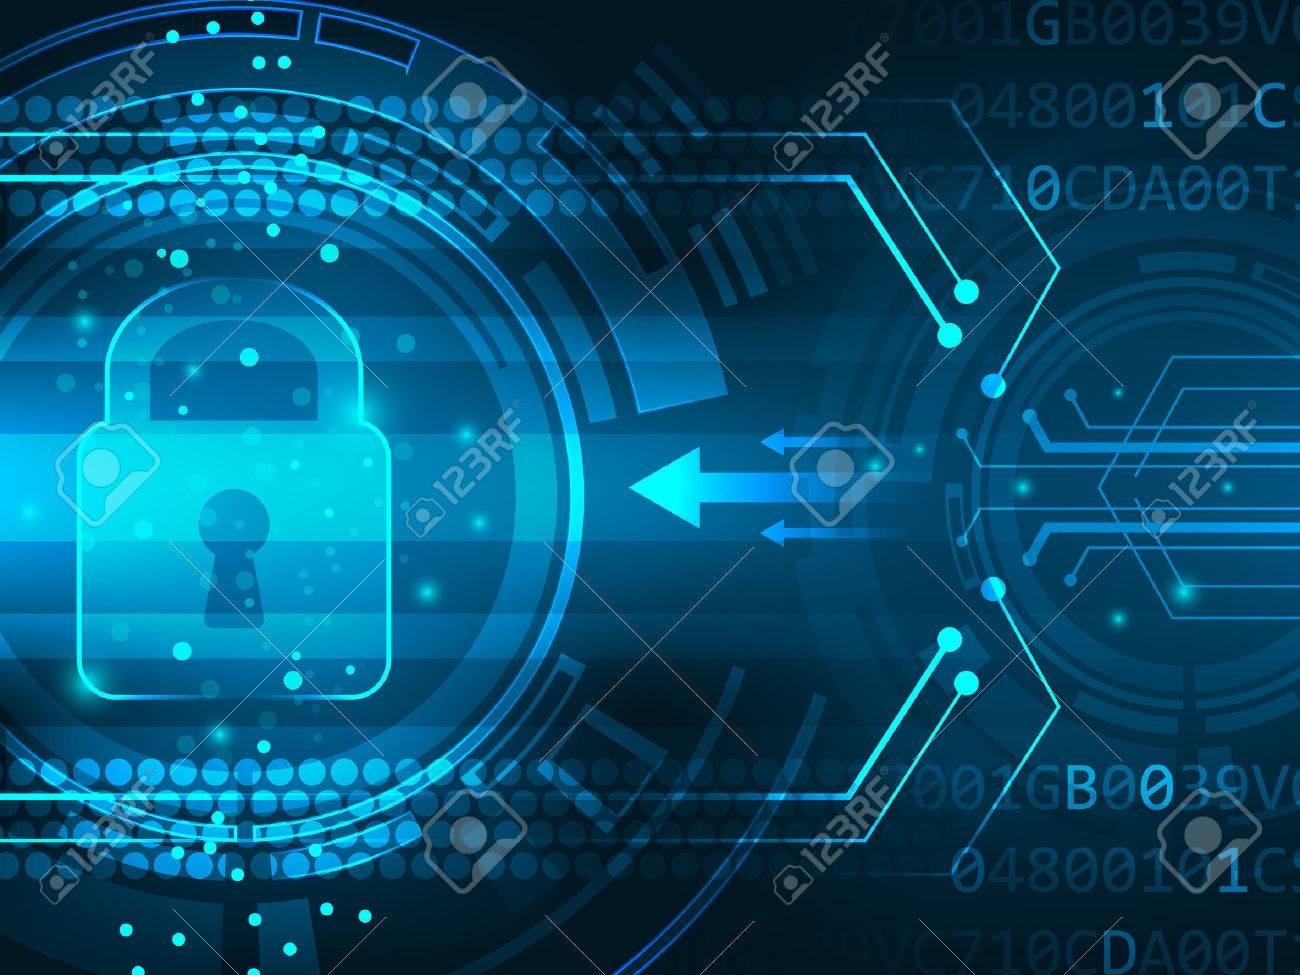 Global security service futuristic background innovation. Vector illustration. - 50917647